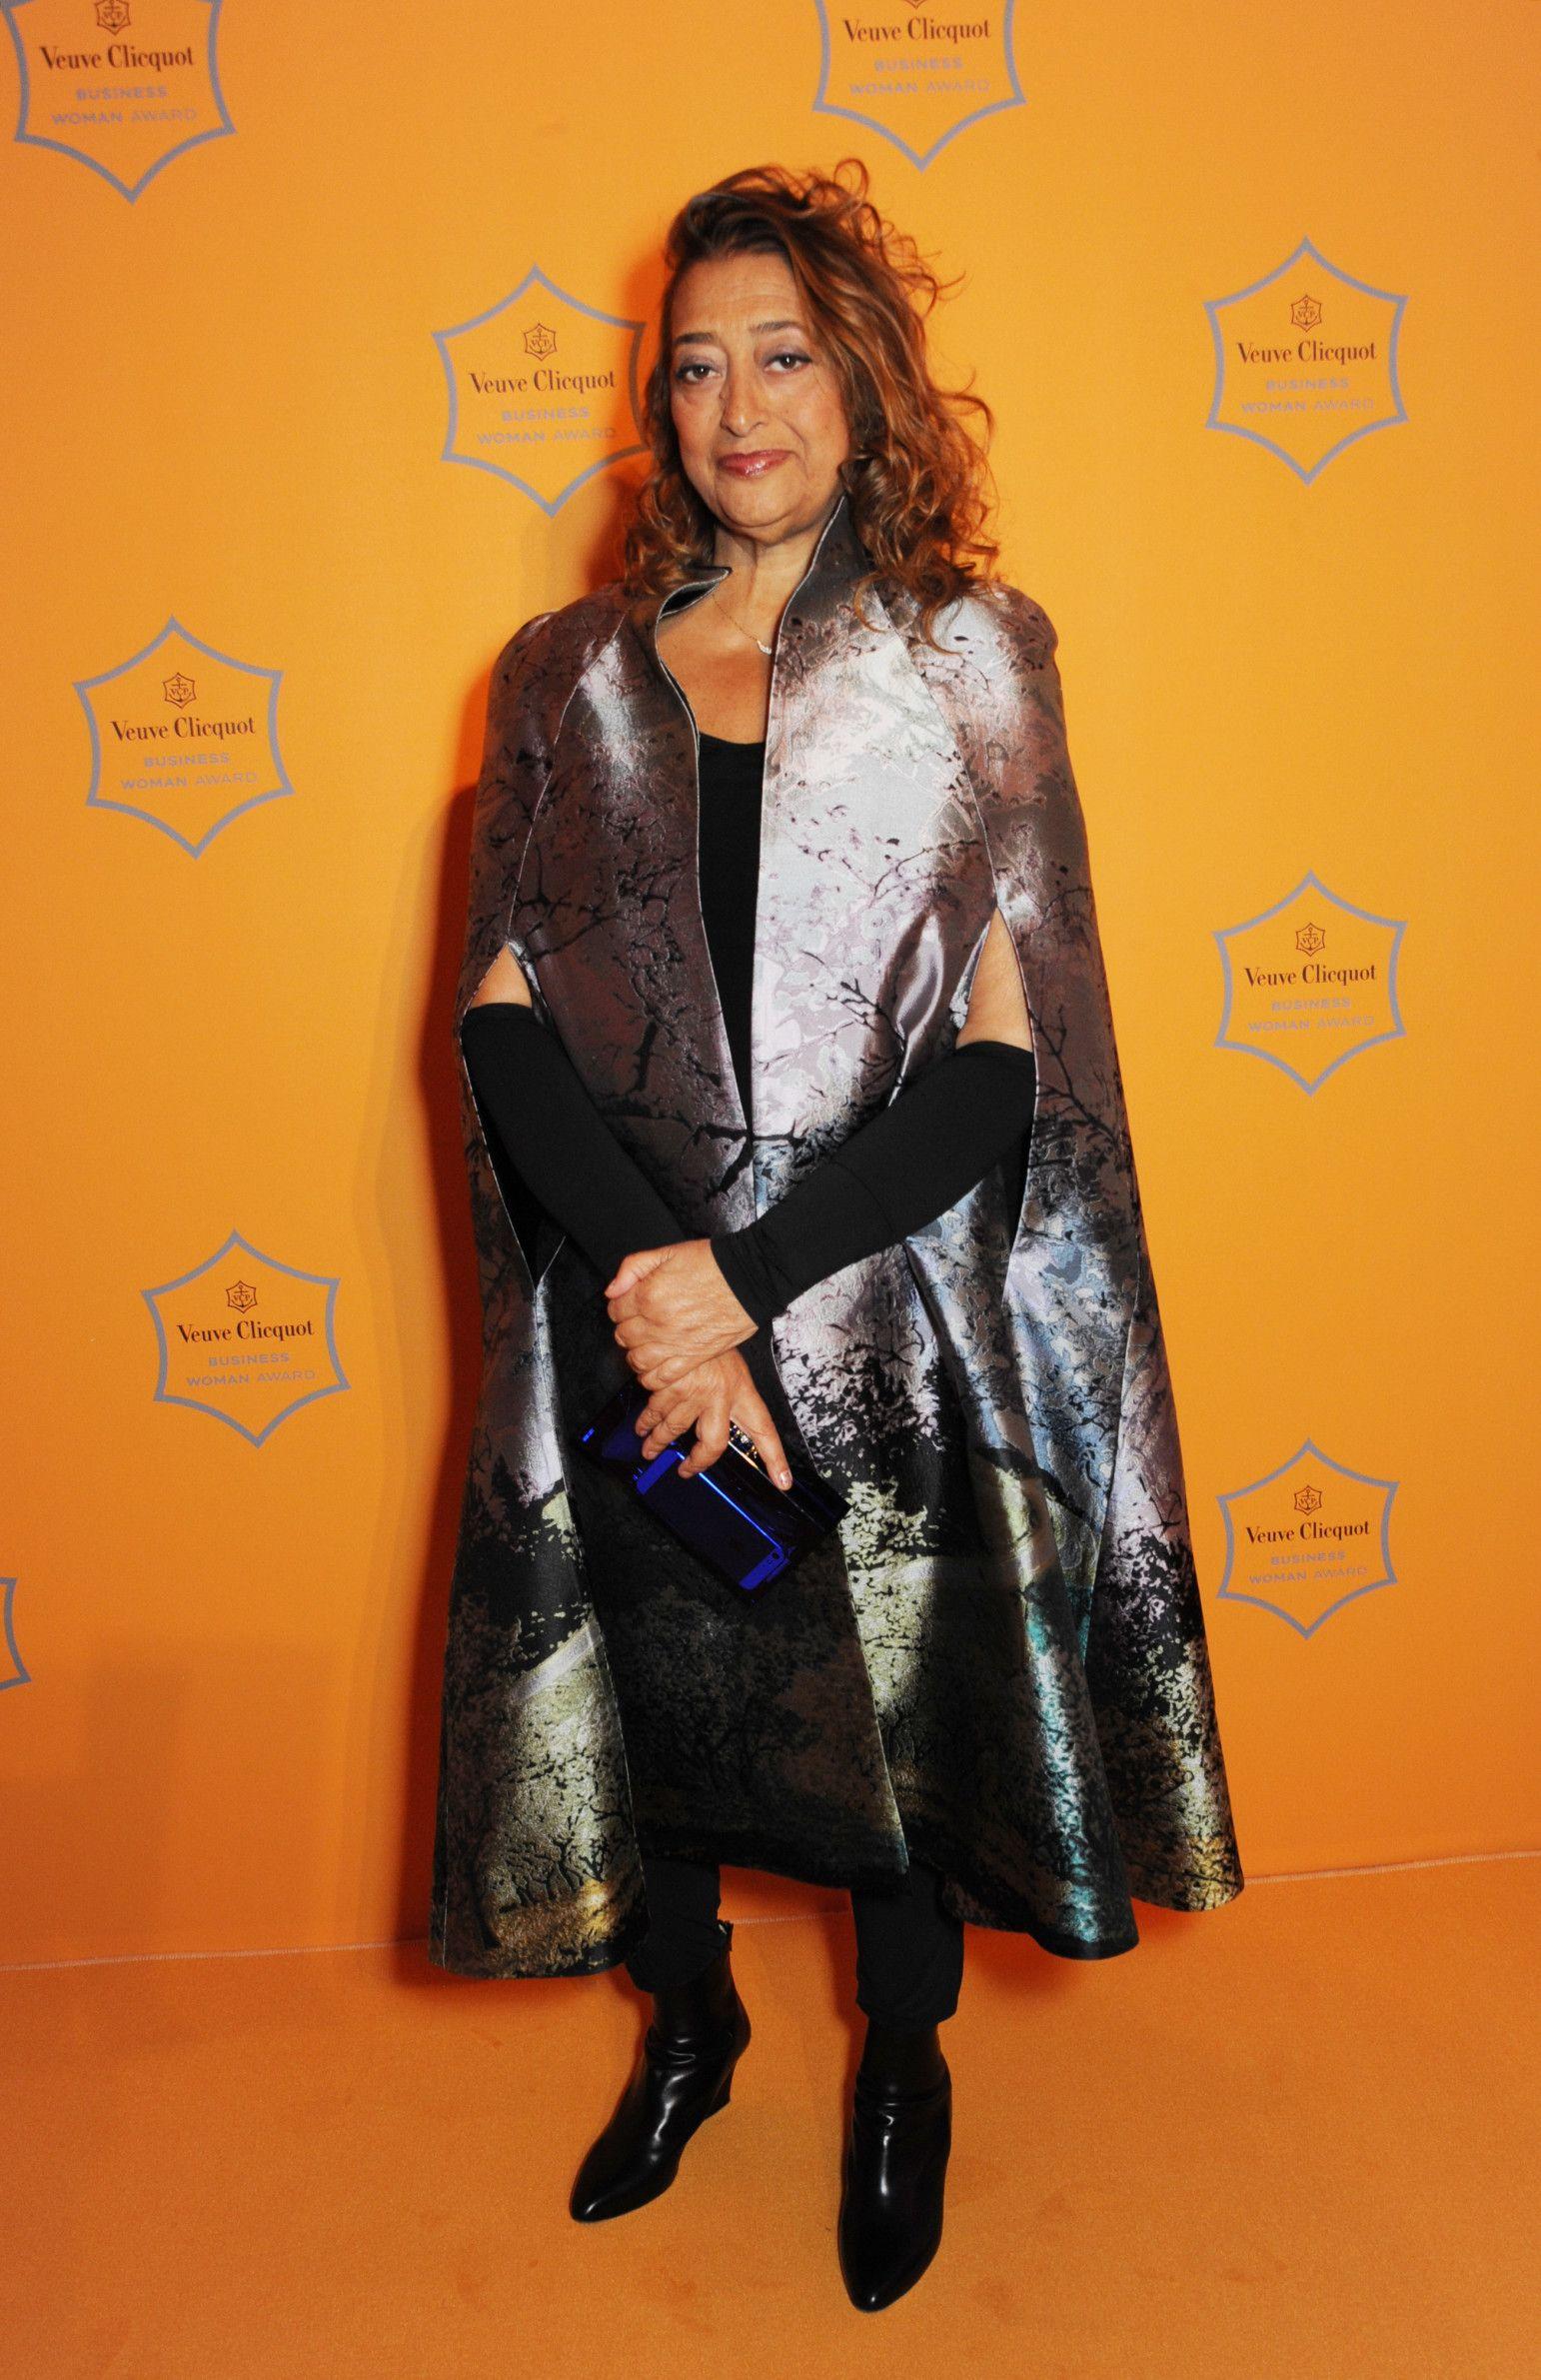 Zaha Hadid 39 S Daring Style Zaha Hadid Zaha Hadid